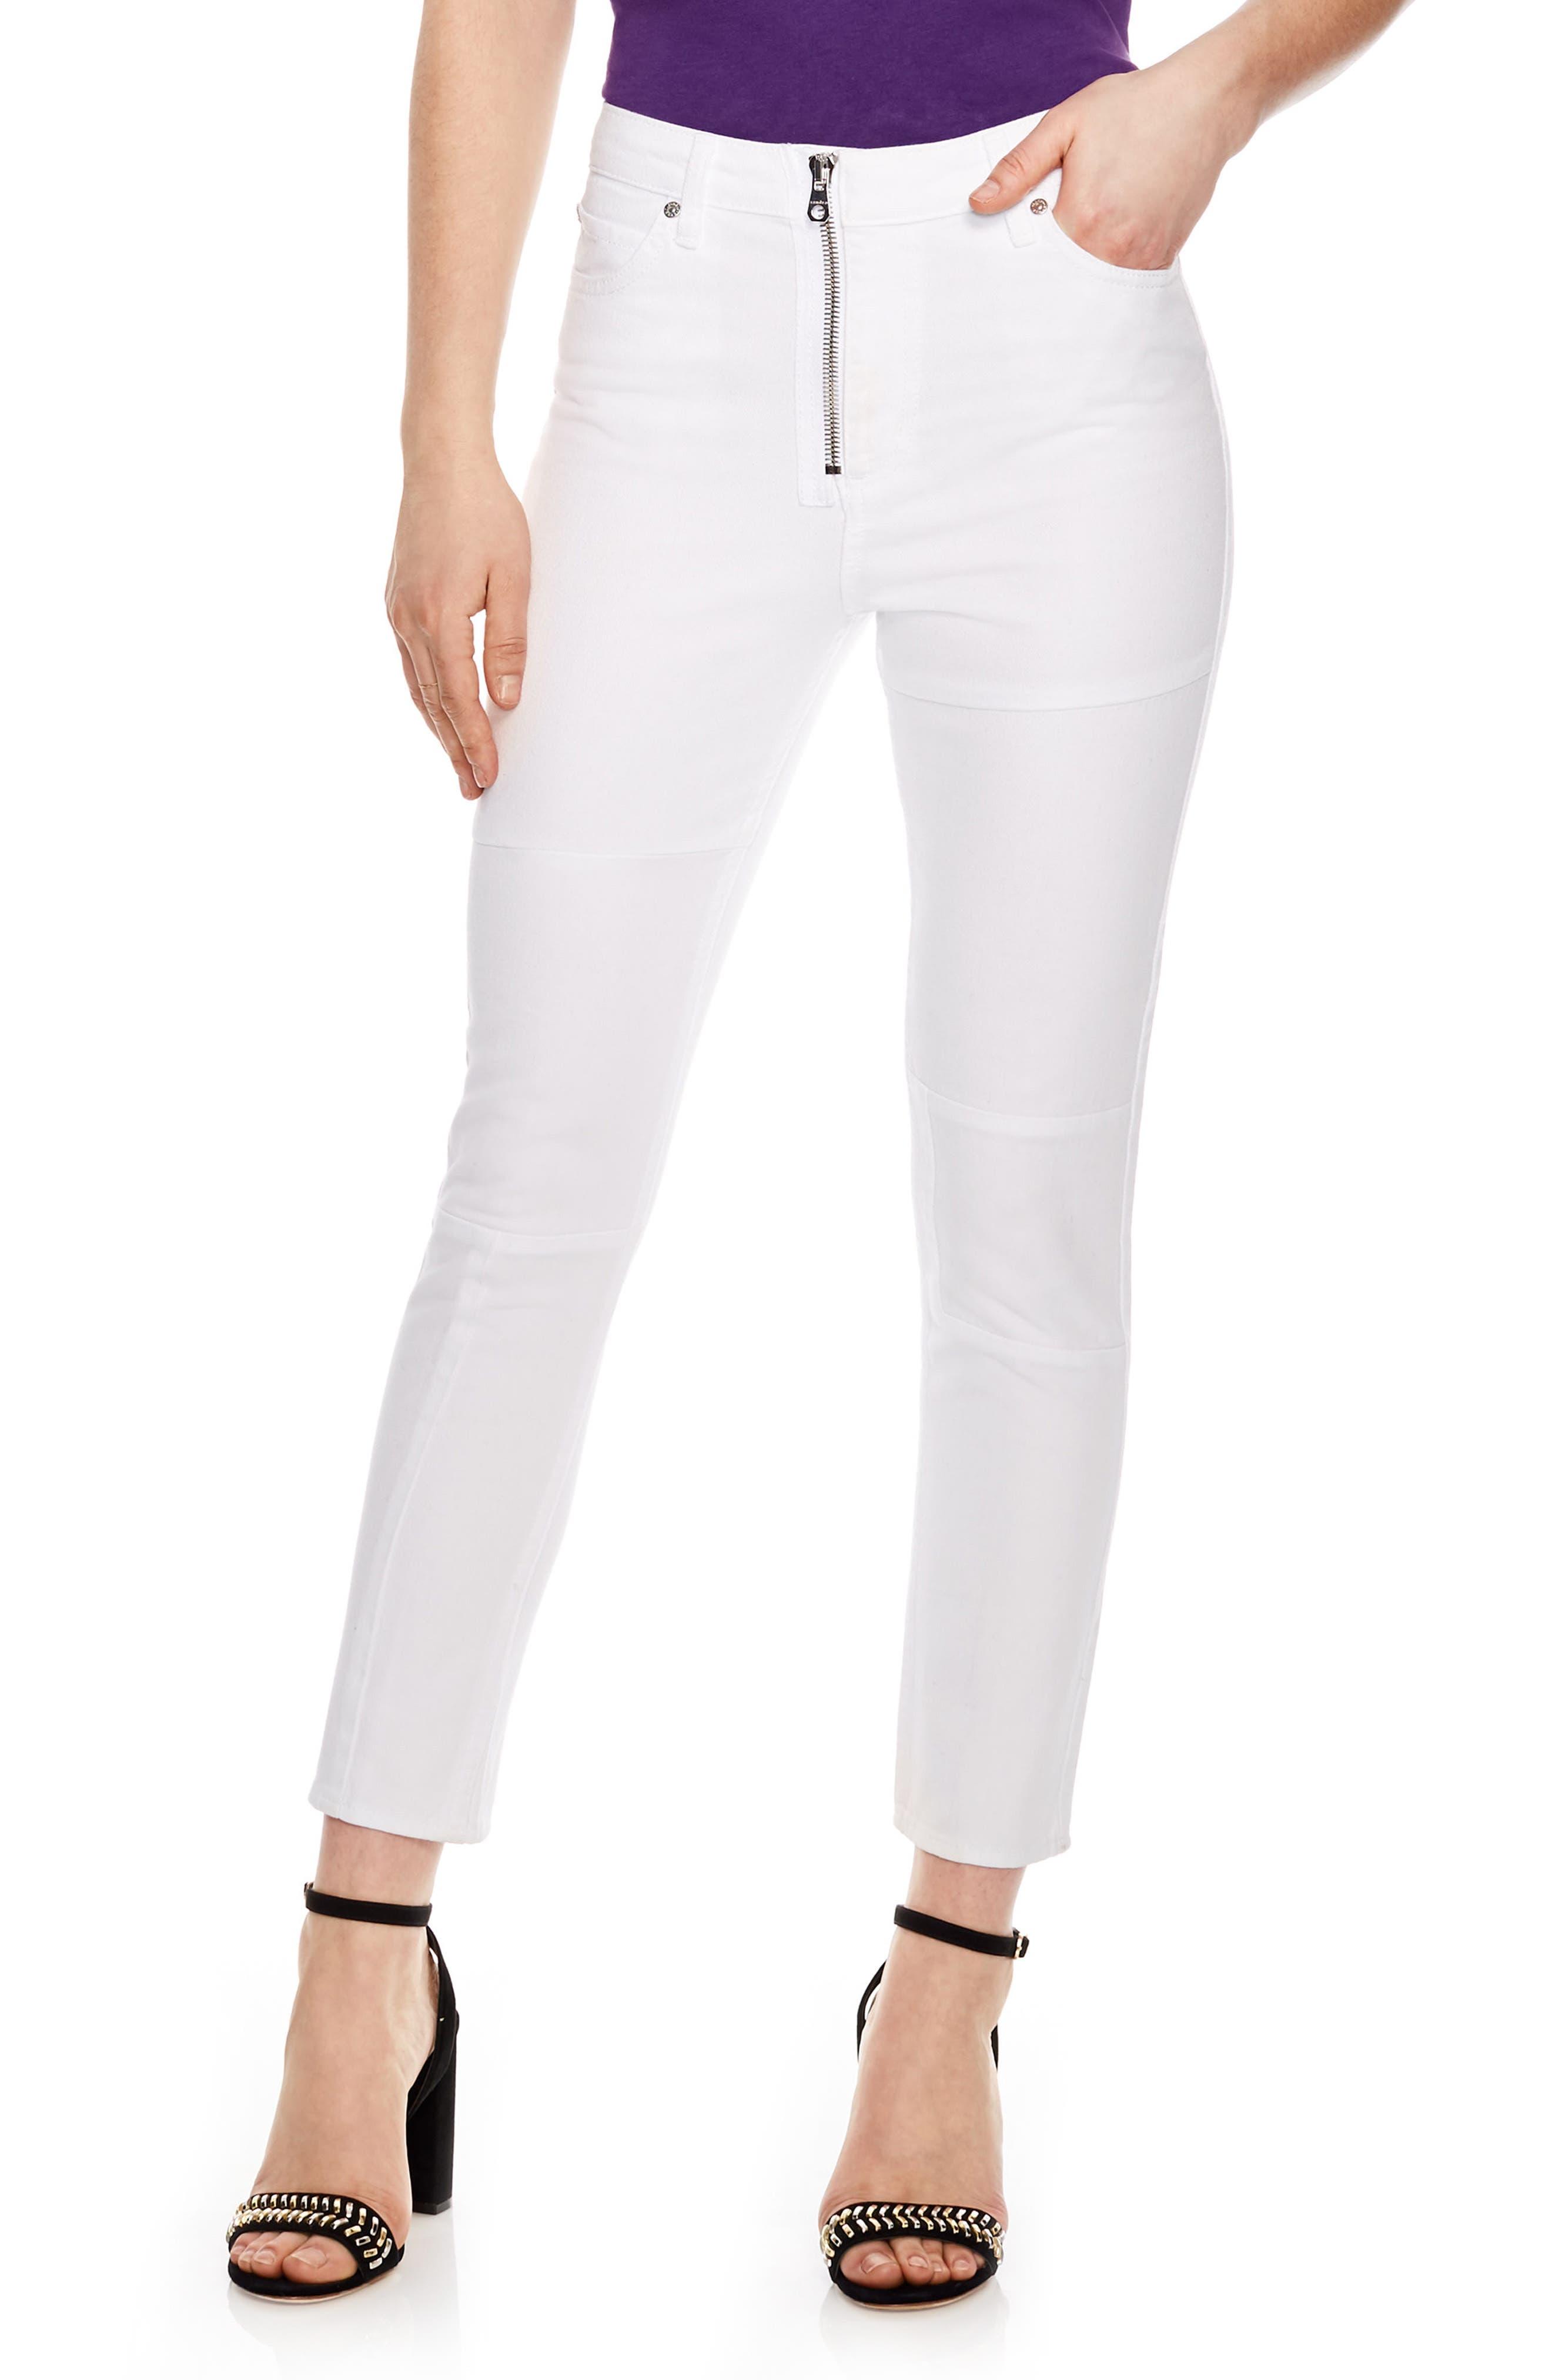 Blanc White Zip Jeans,                         Main,                         color, White